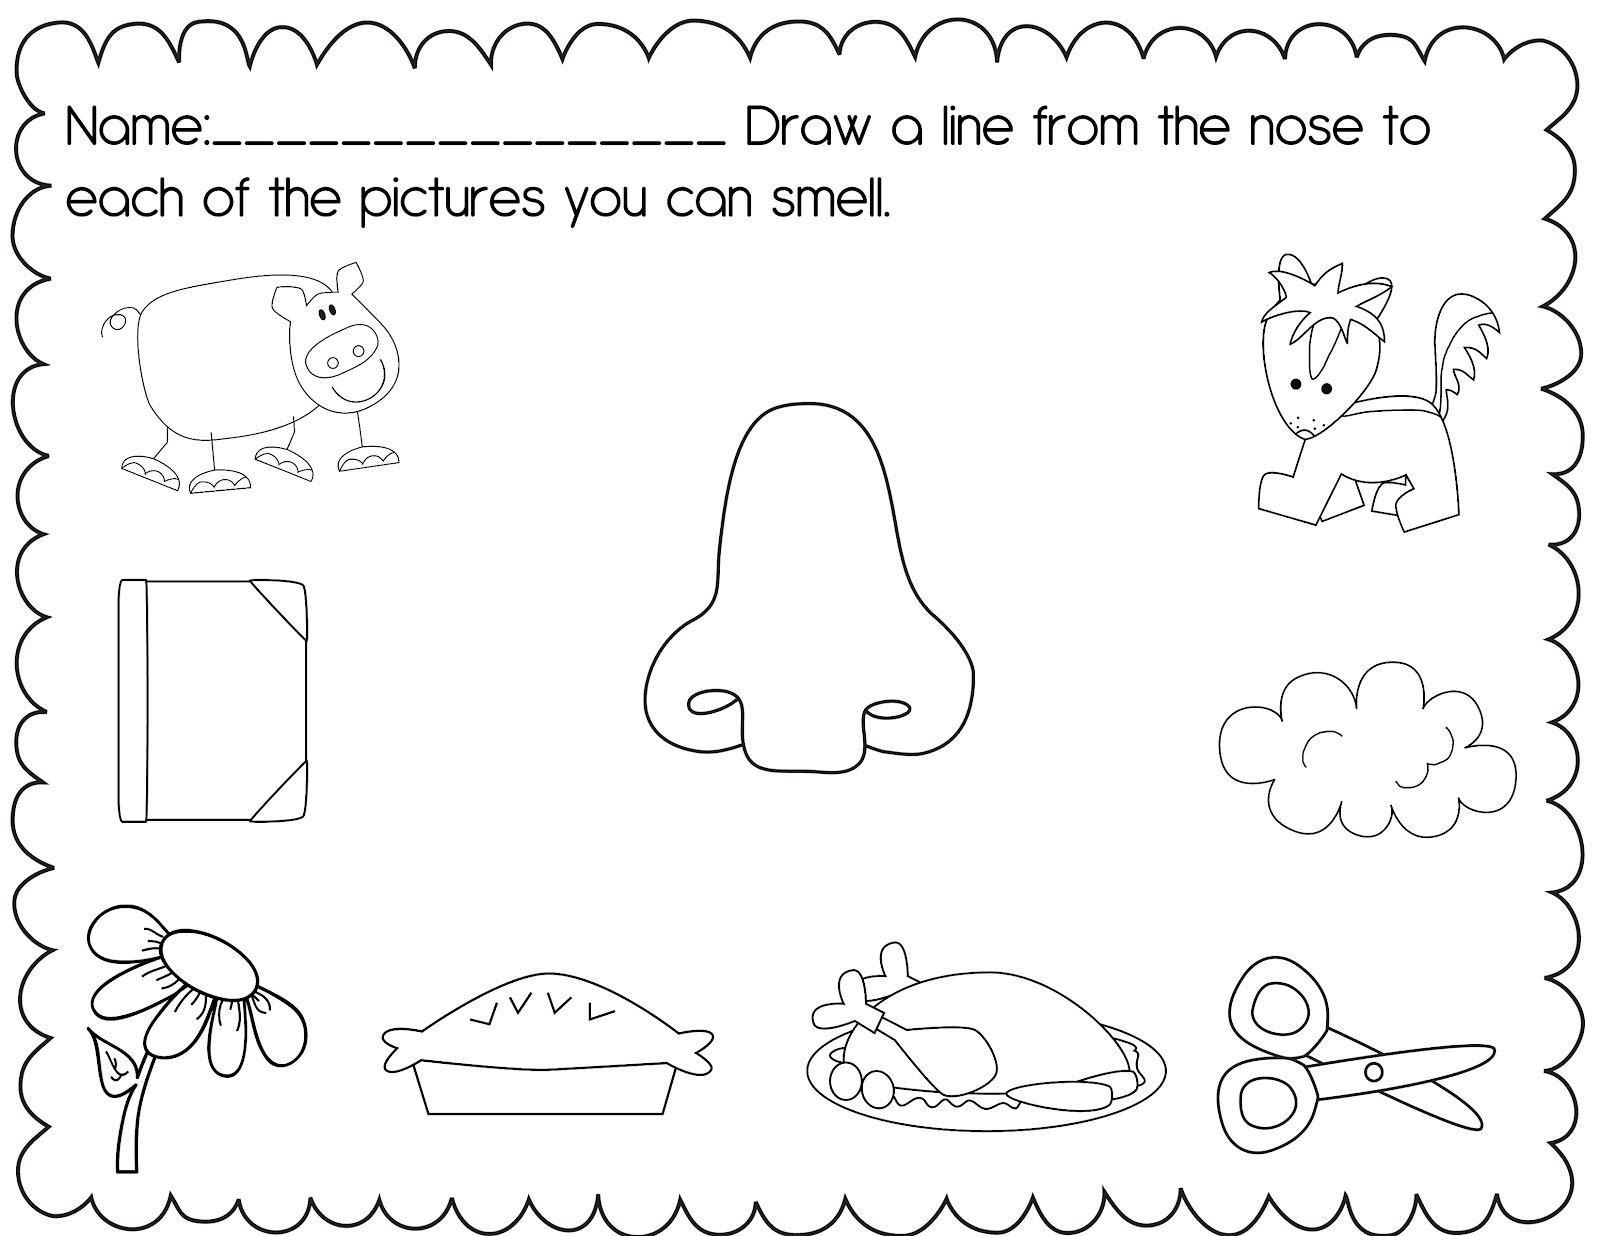 5 Senses Worksheets For Kindergarten